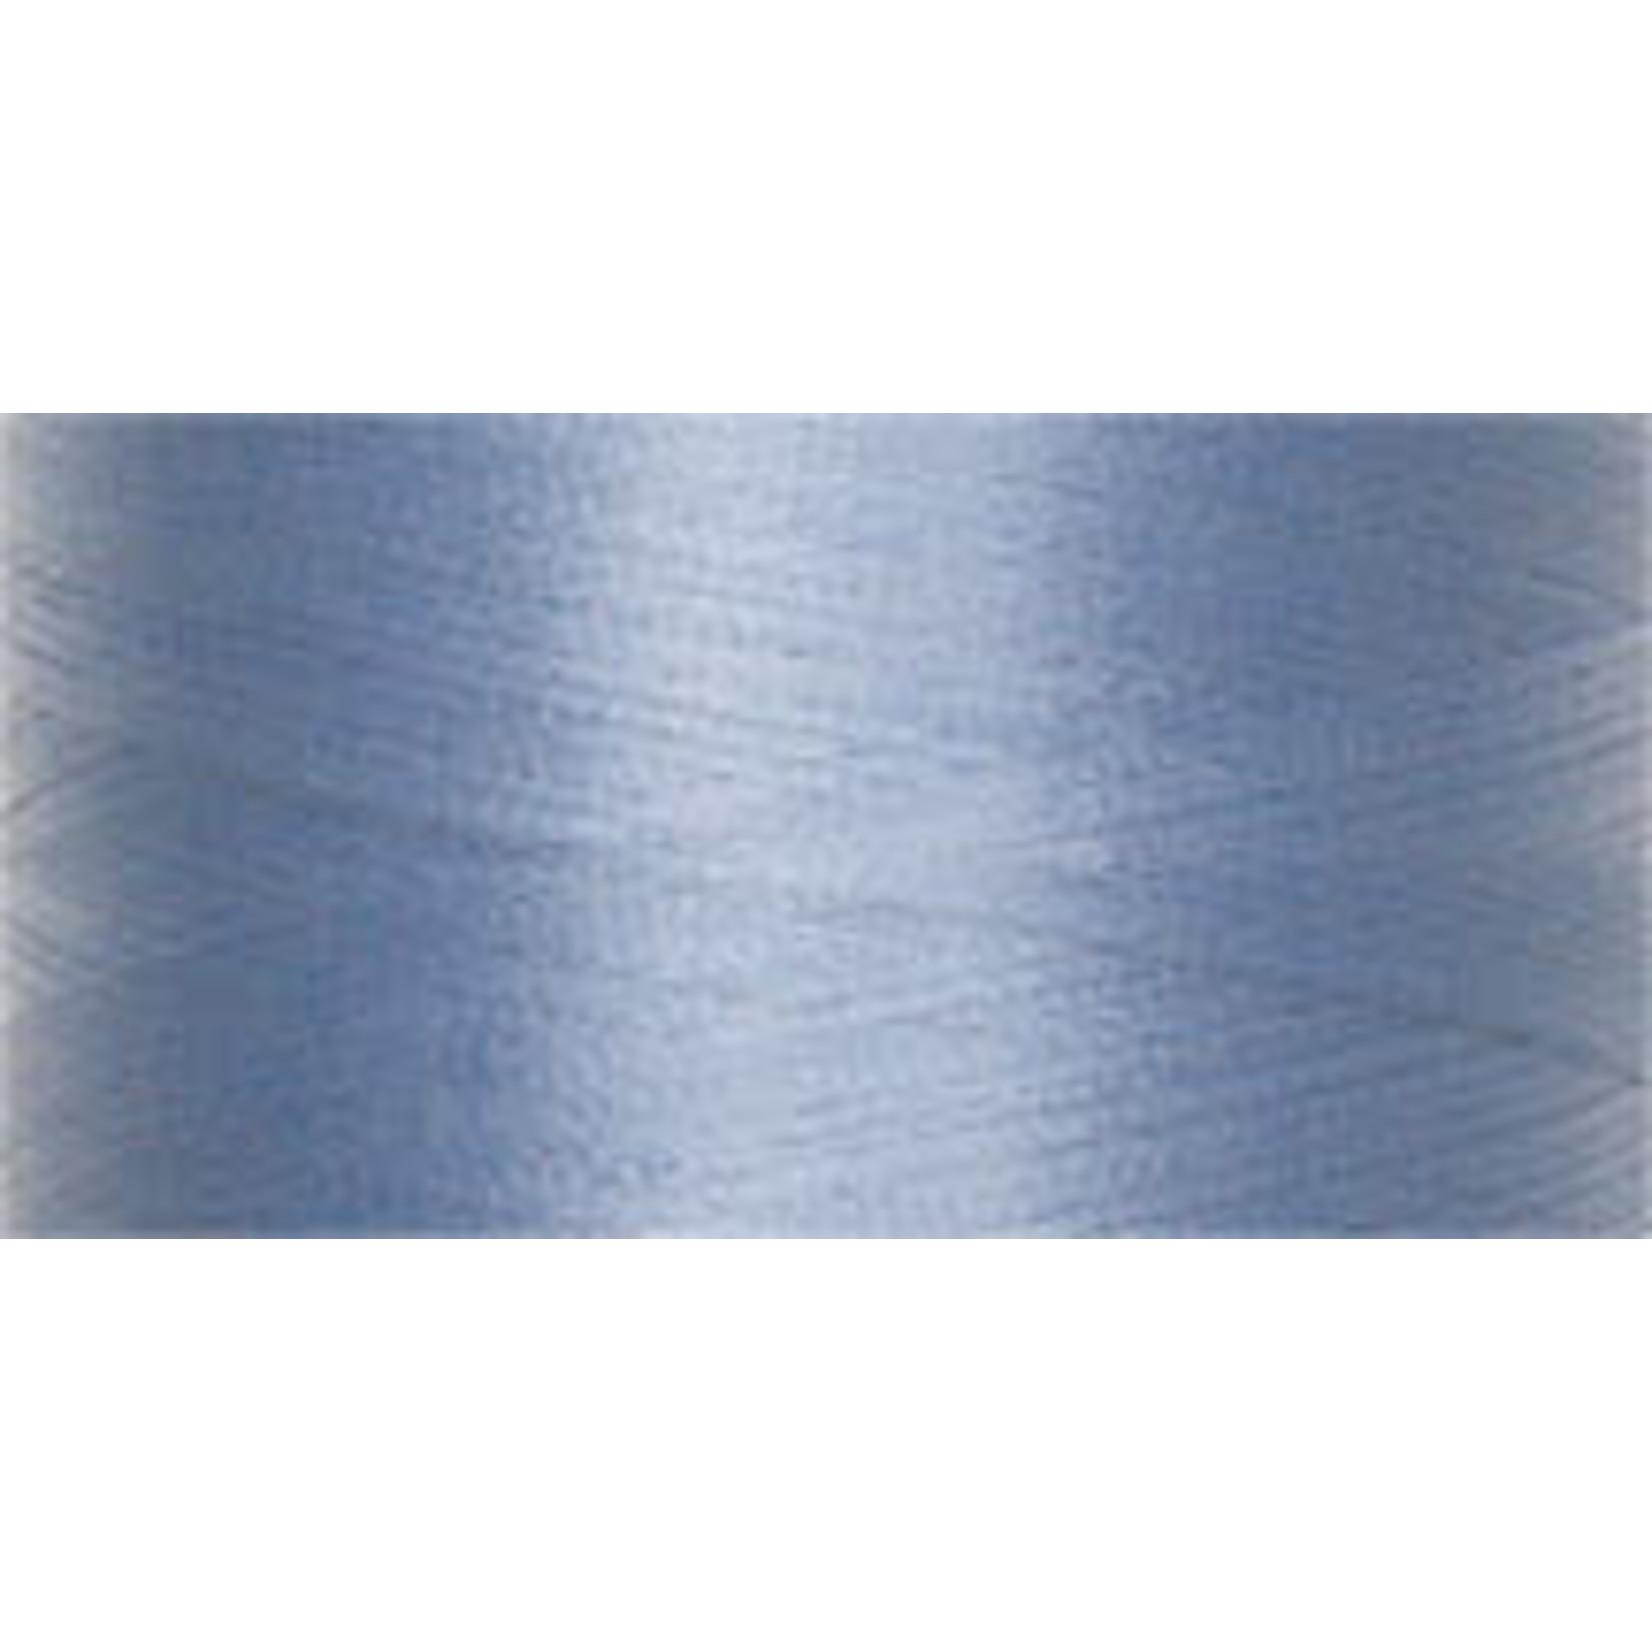 Superior Threads Bottom Line - #60 - 1300 m - 610 Light Blue